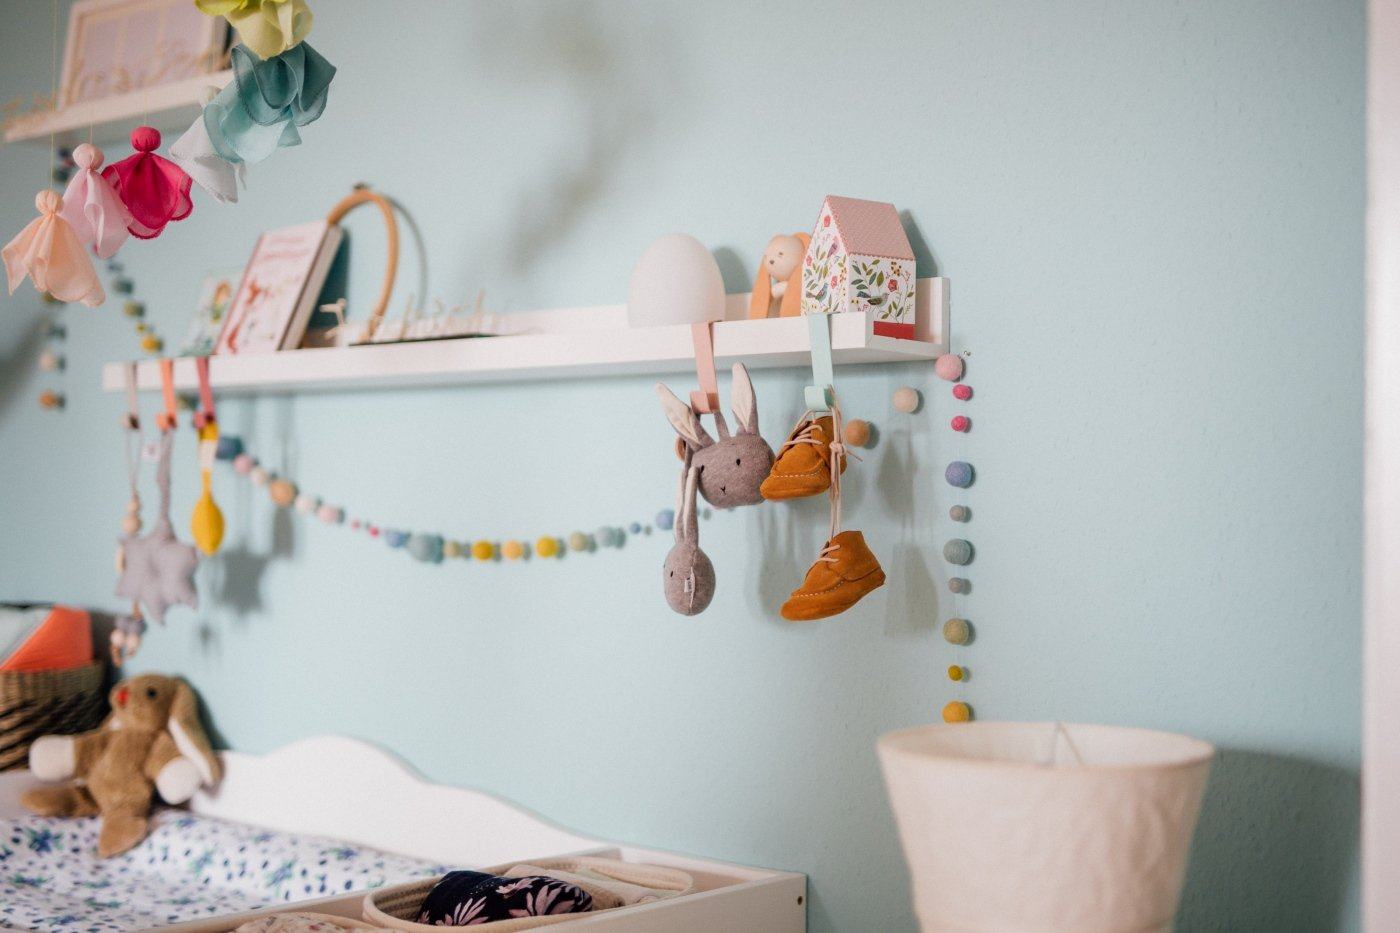 Babybauchfotos-Schwangerschaft-Paarfotos-Homeshooting-Pfalz-Landau-Karlsruhe-Kinderzimmer